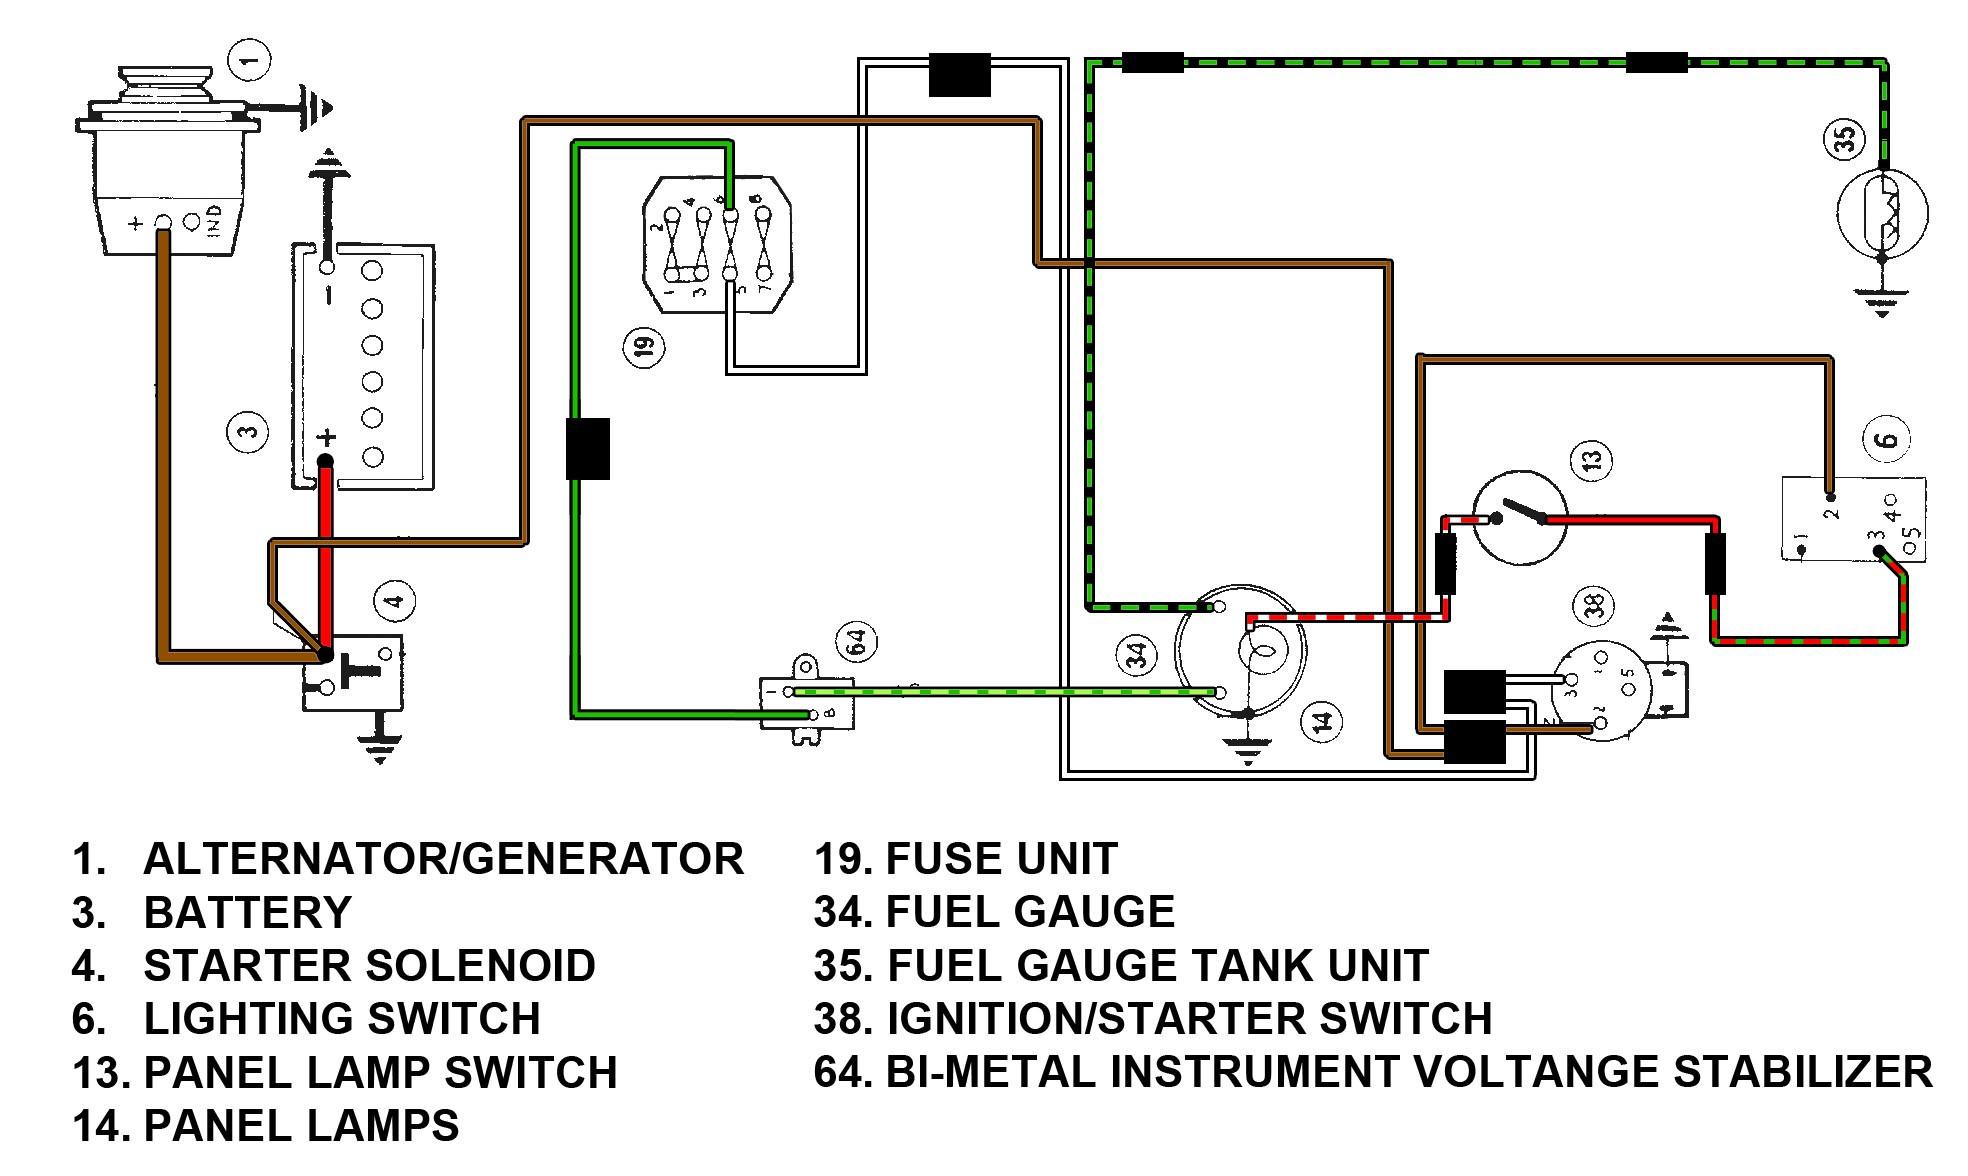 Vdo Gauges Wiring Diagrams Sprid Guru Tech Index Fuel Gauge Wiring Diagram New Hbphelp Of Vdo Gauges Wiring Diagrams